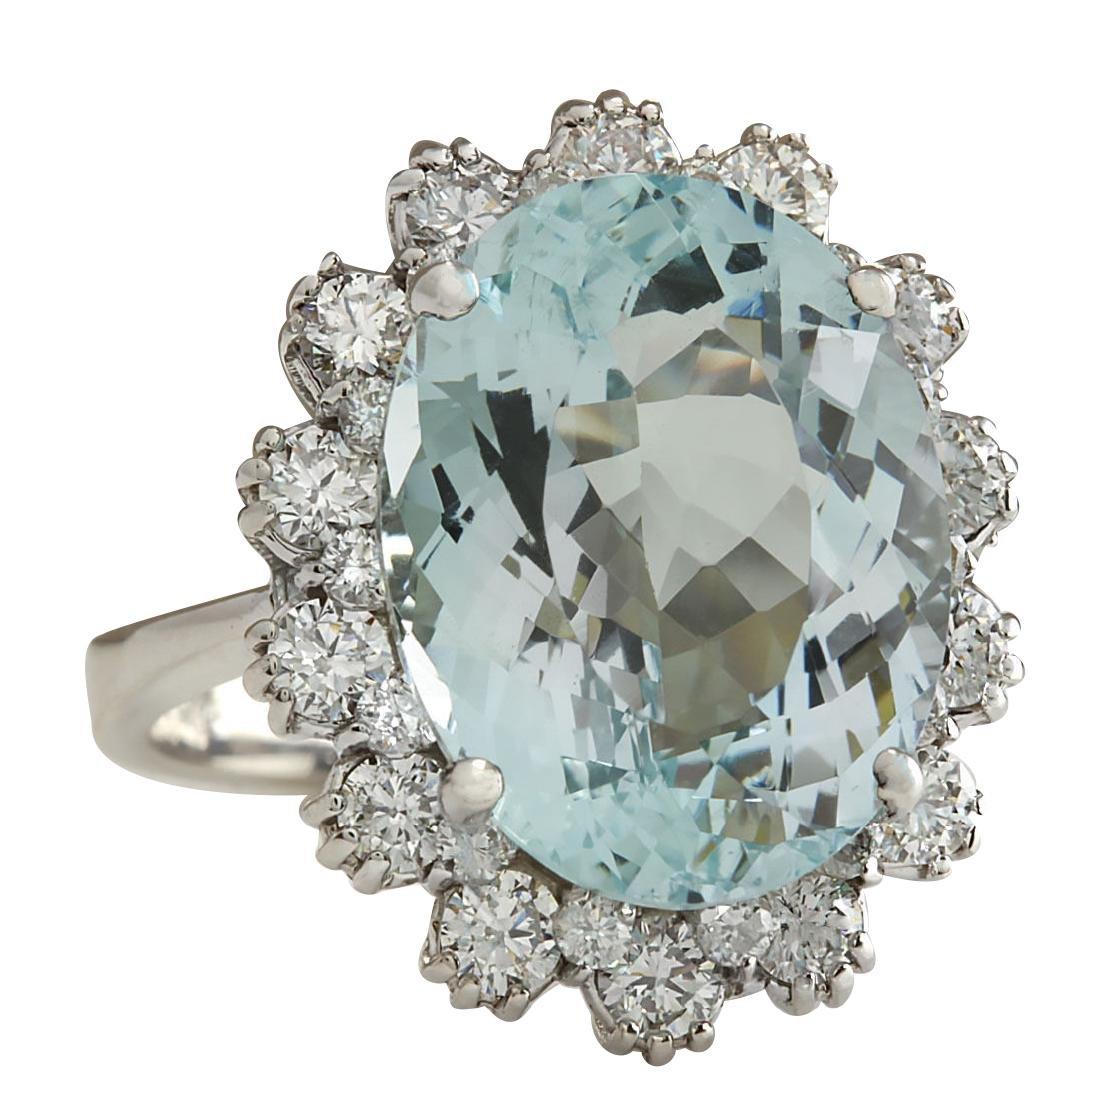 10.25CTW Natural Aquamarine And Diamond Ring In 18K - 2